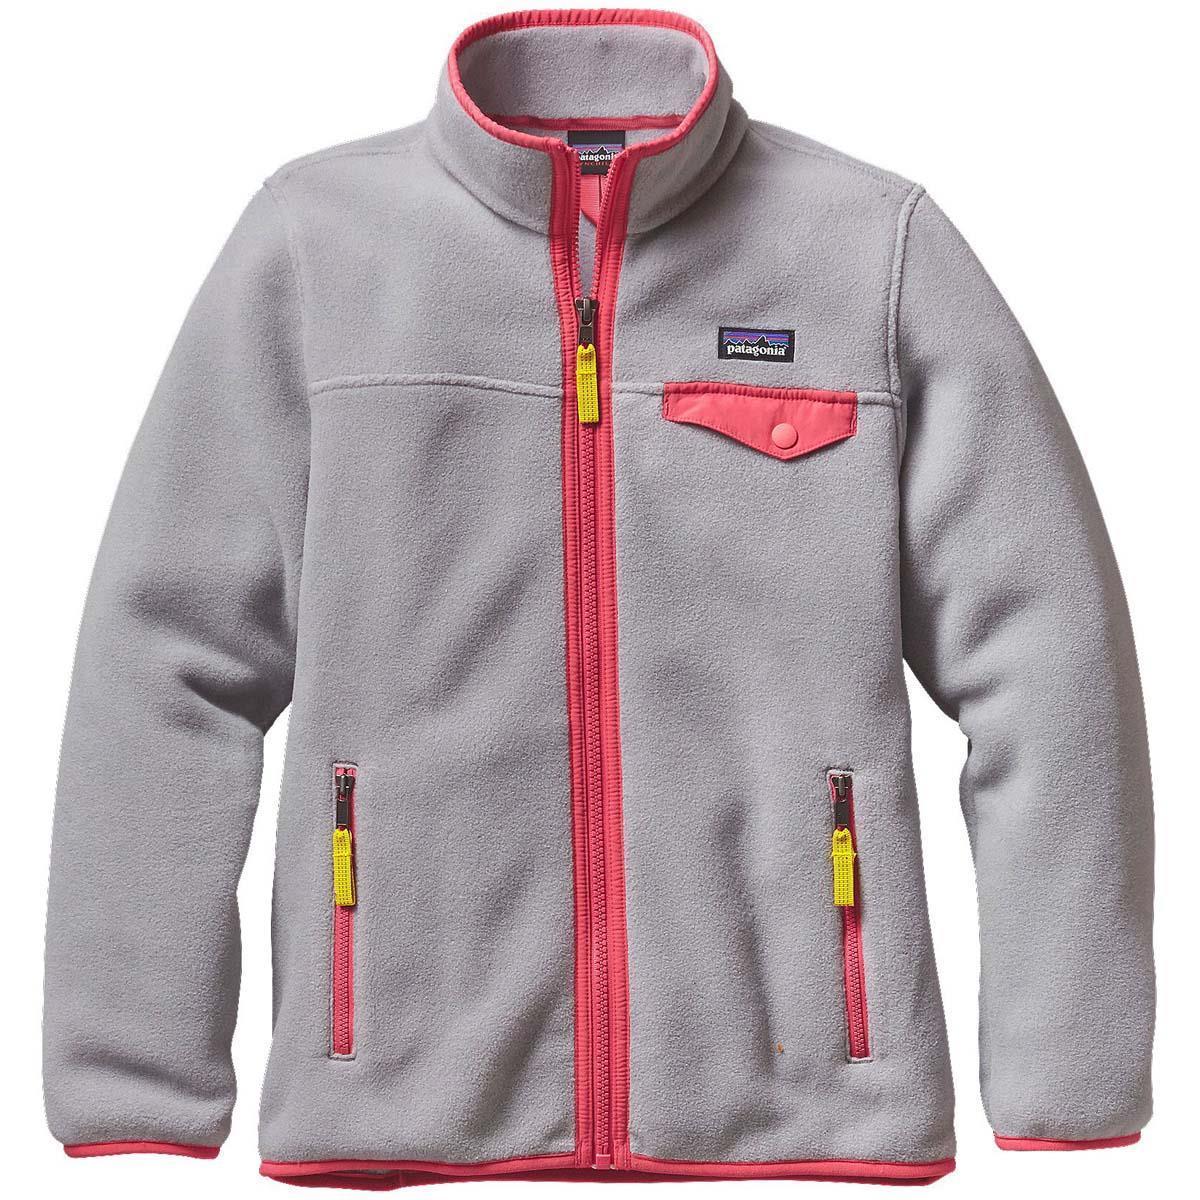 f06ef9b0489 Patagonia Lightweight Synchilla Snap T Jacket Girls. Loading zoom